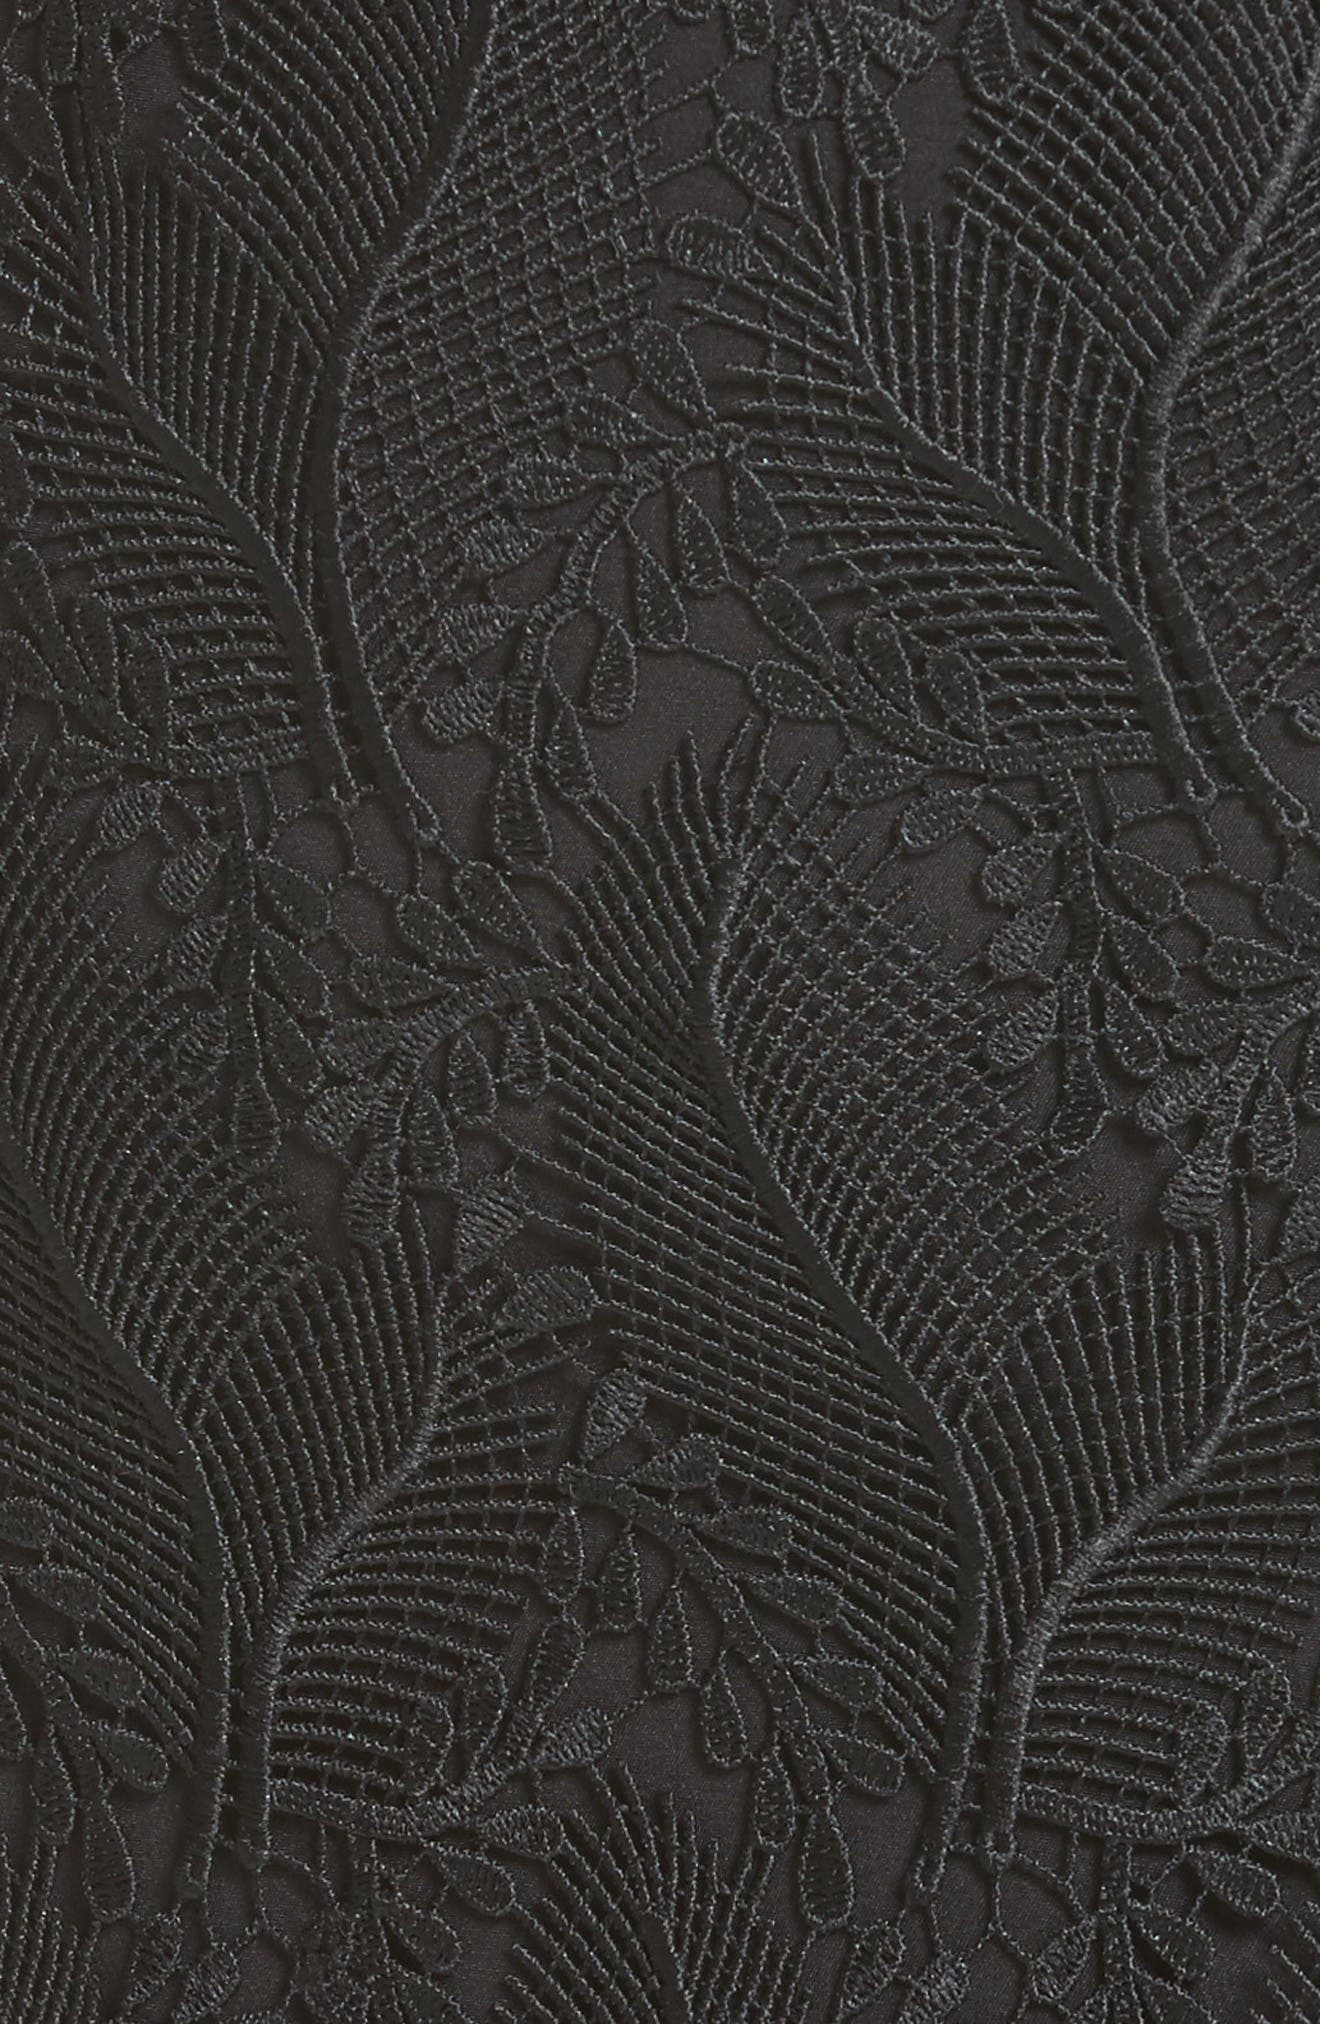 Lace Overlay Pencil Skirt,                             Alternate thumbnail 6, color,                             Black